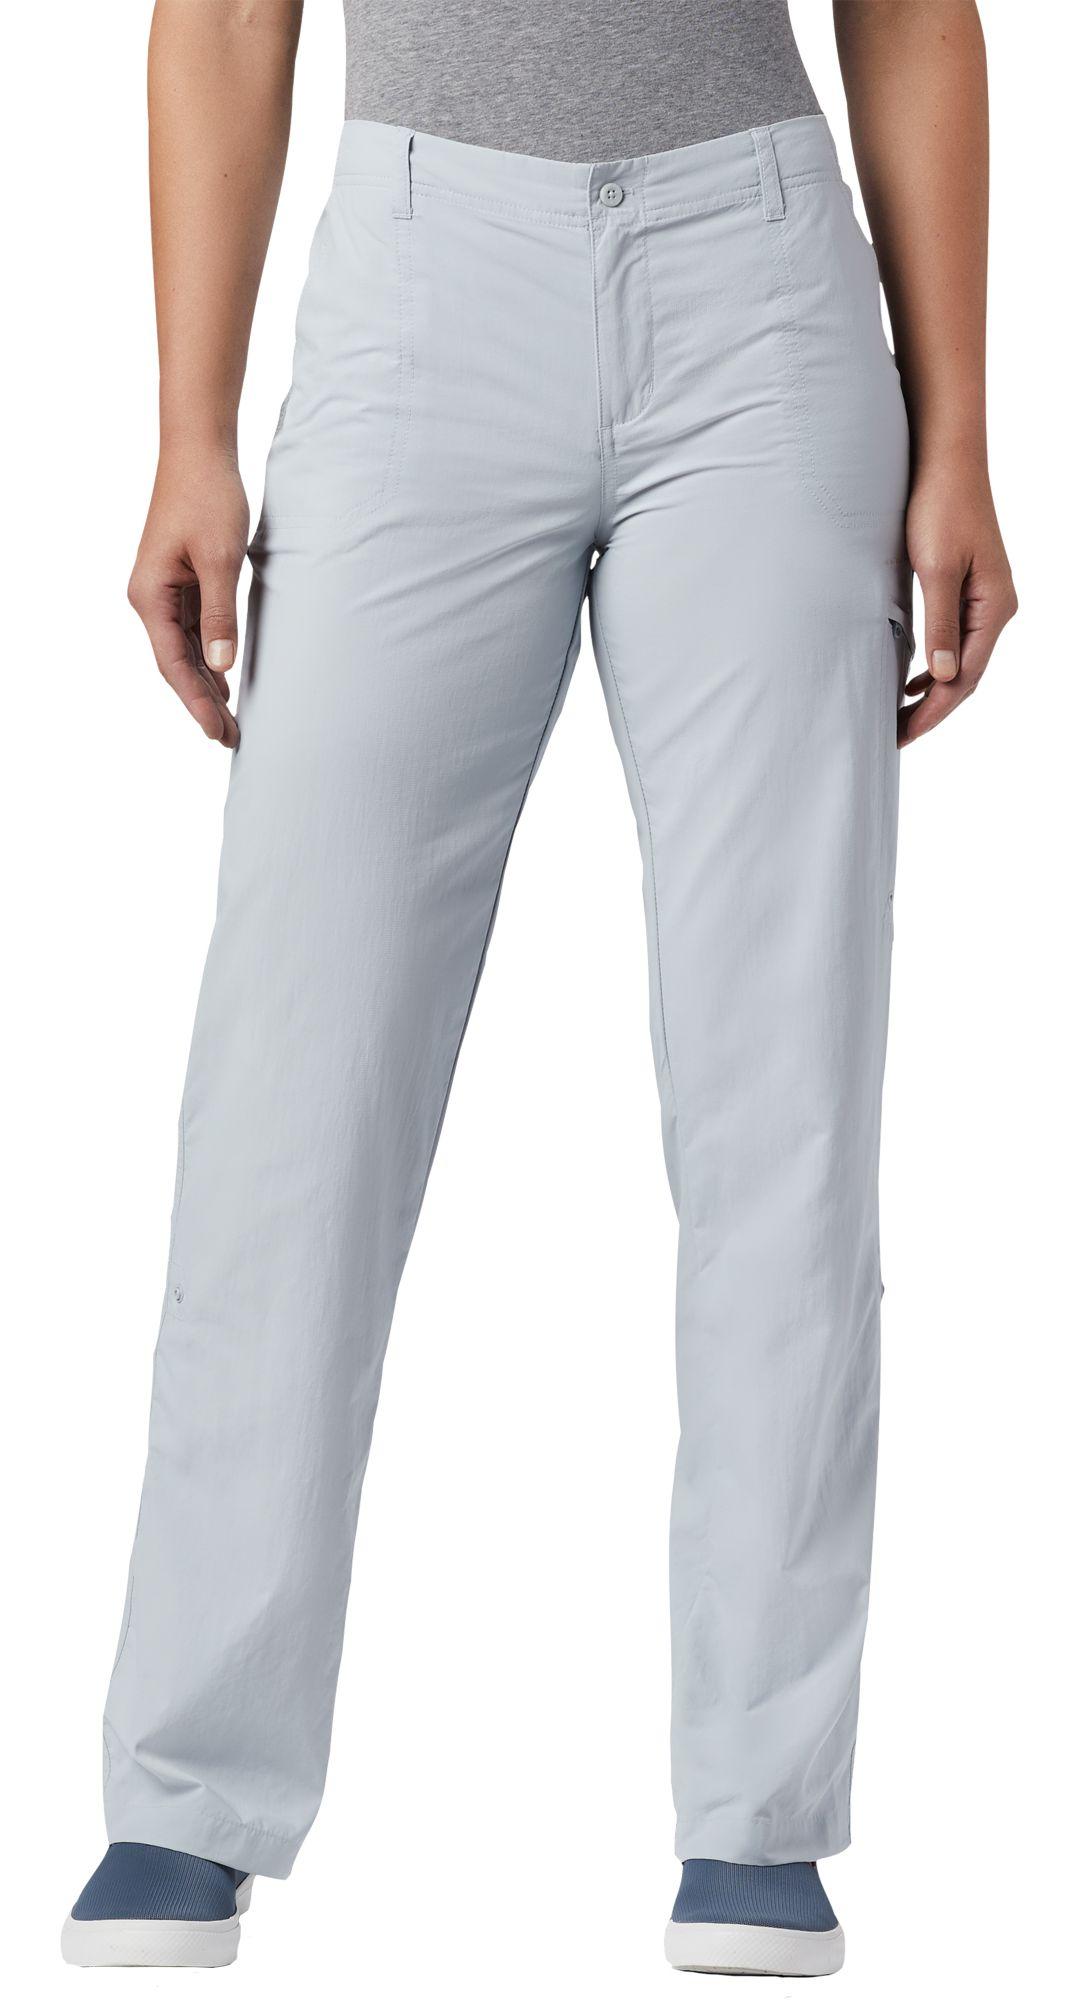 578eee1c31a Columbia Women's PFG Aruba Roll Up Pants | DICK'S Sporting Goods